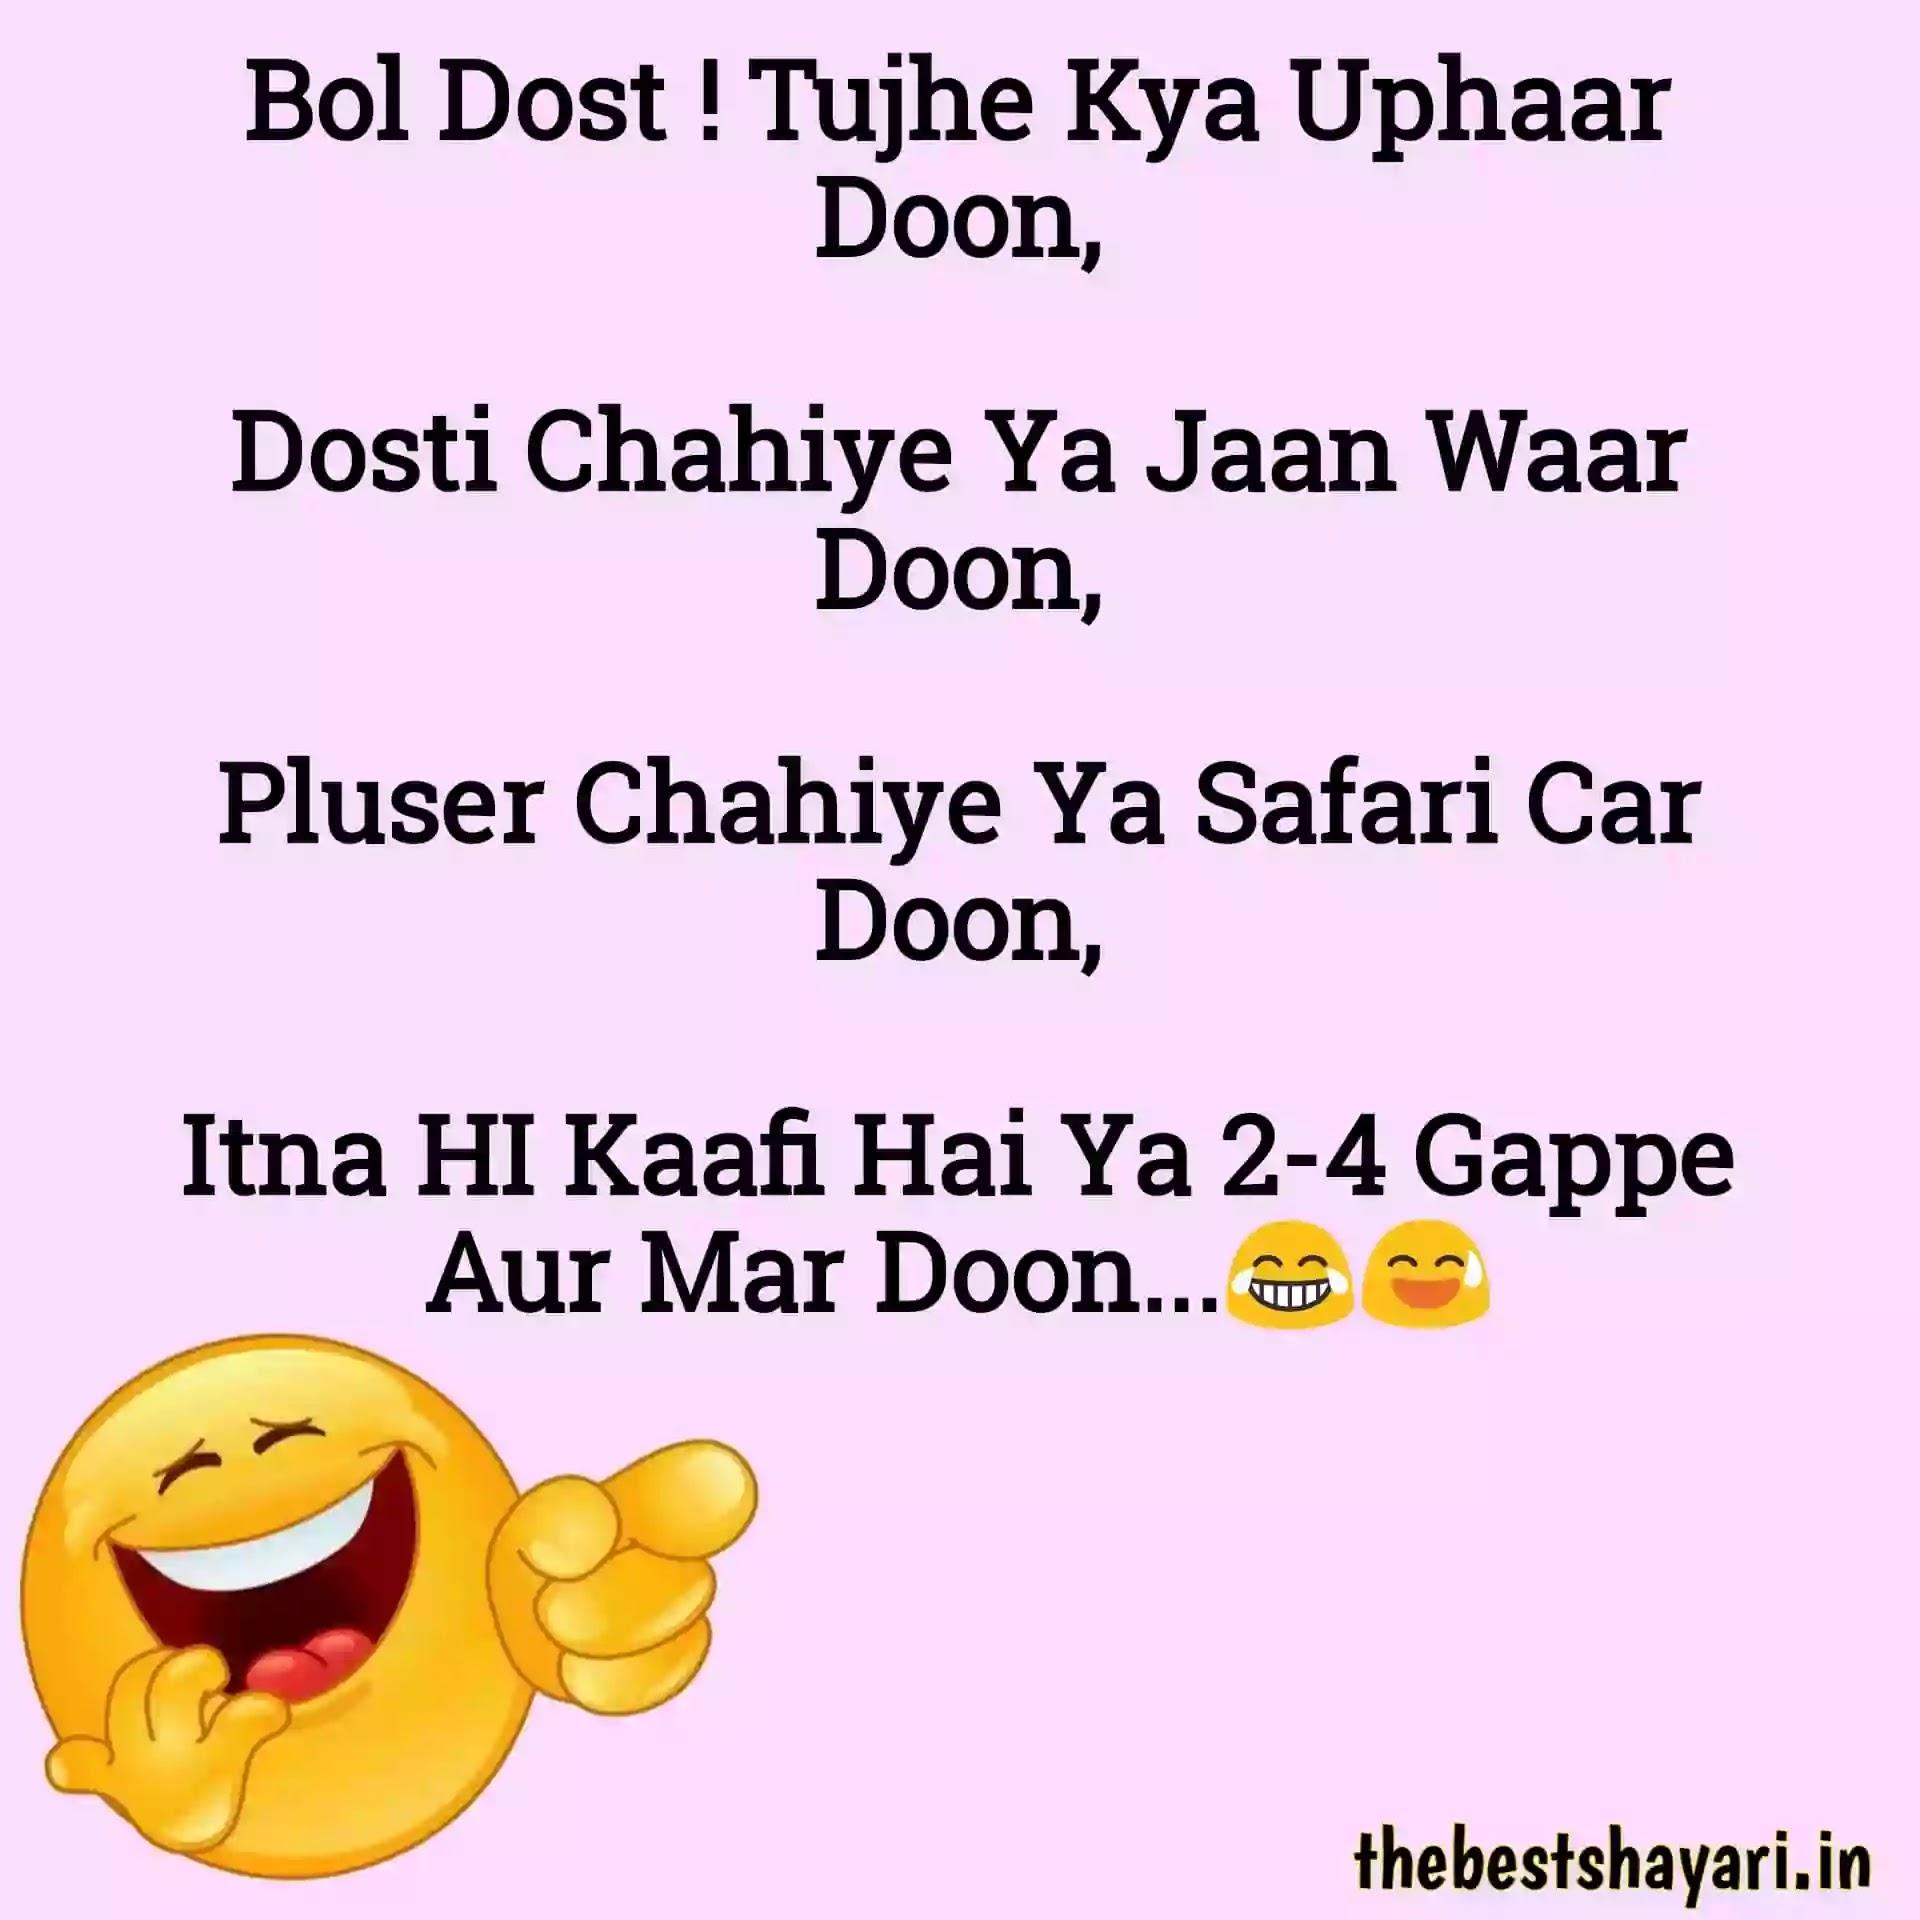 Funny jokes on friendship in English